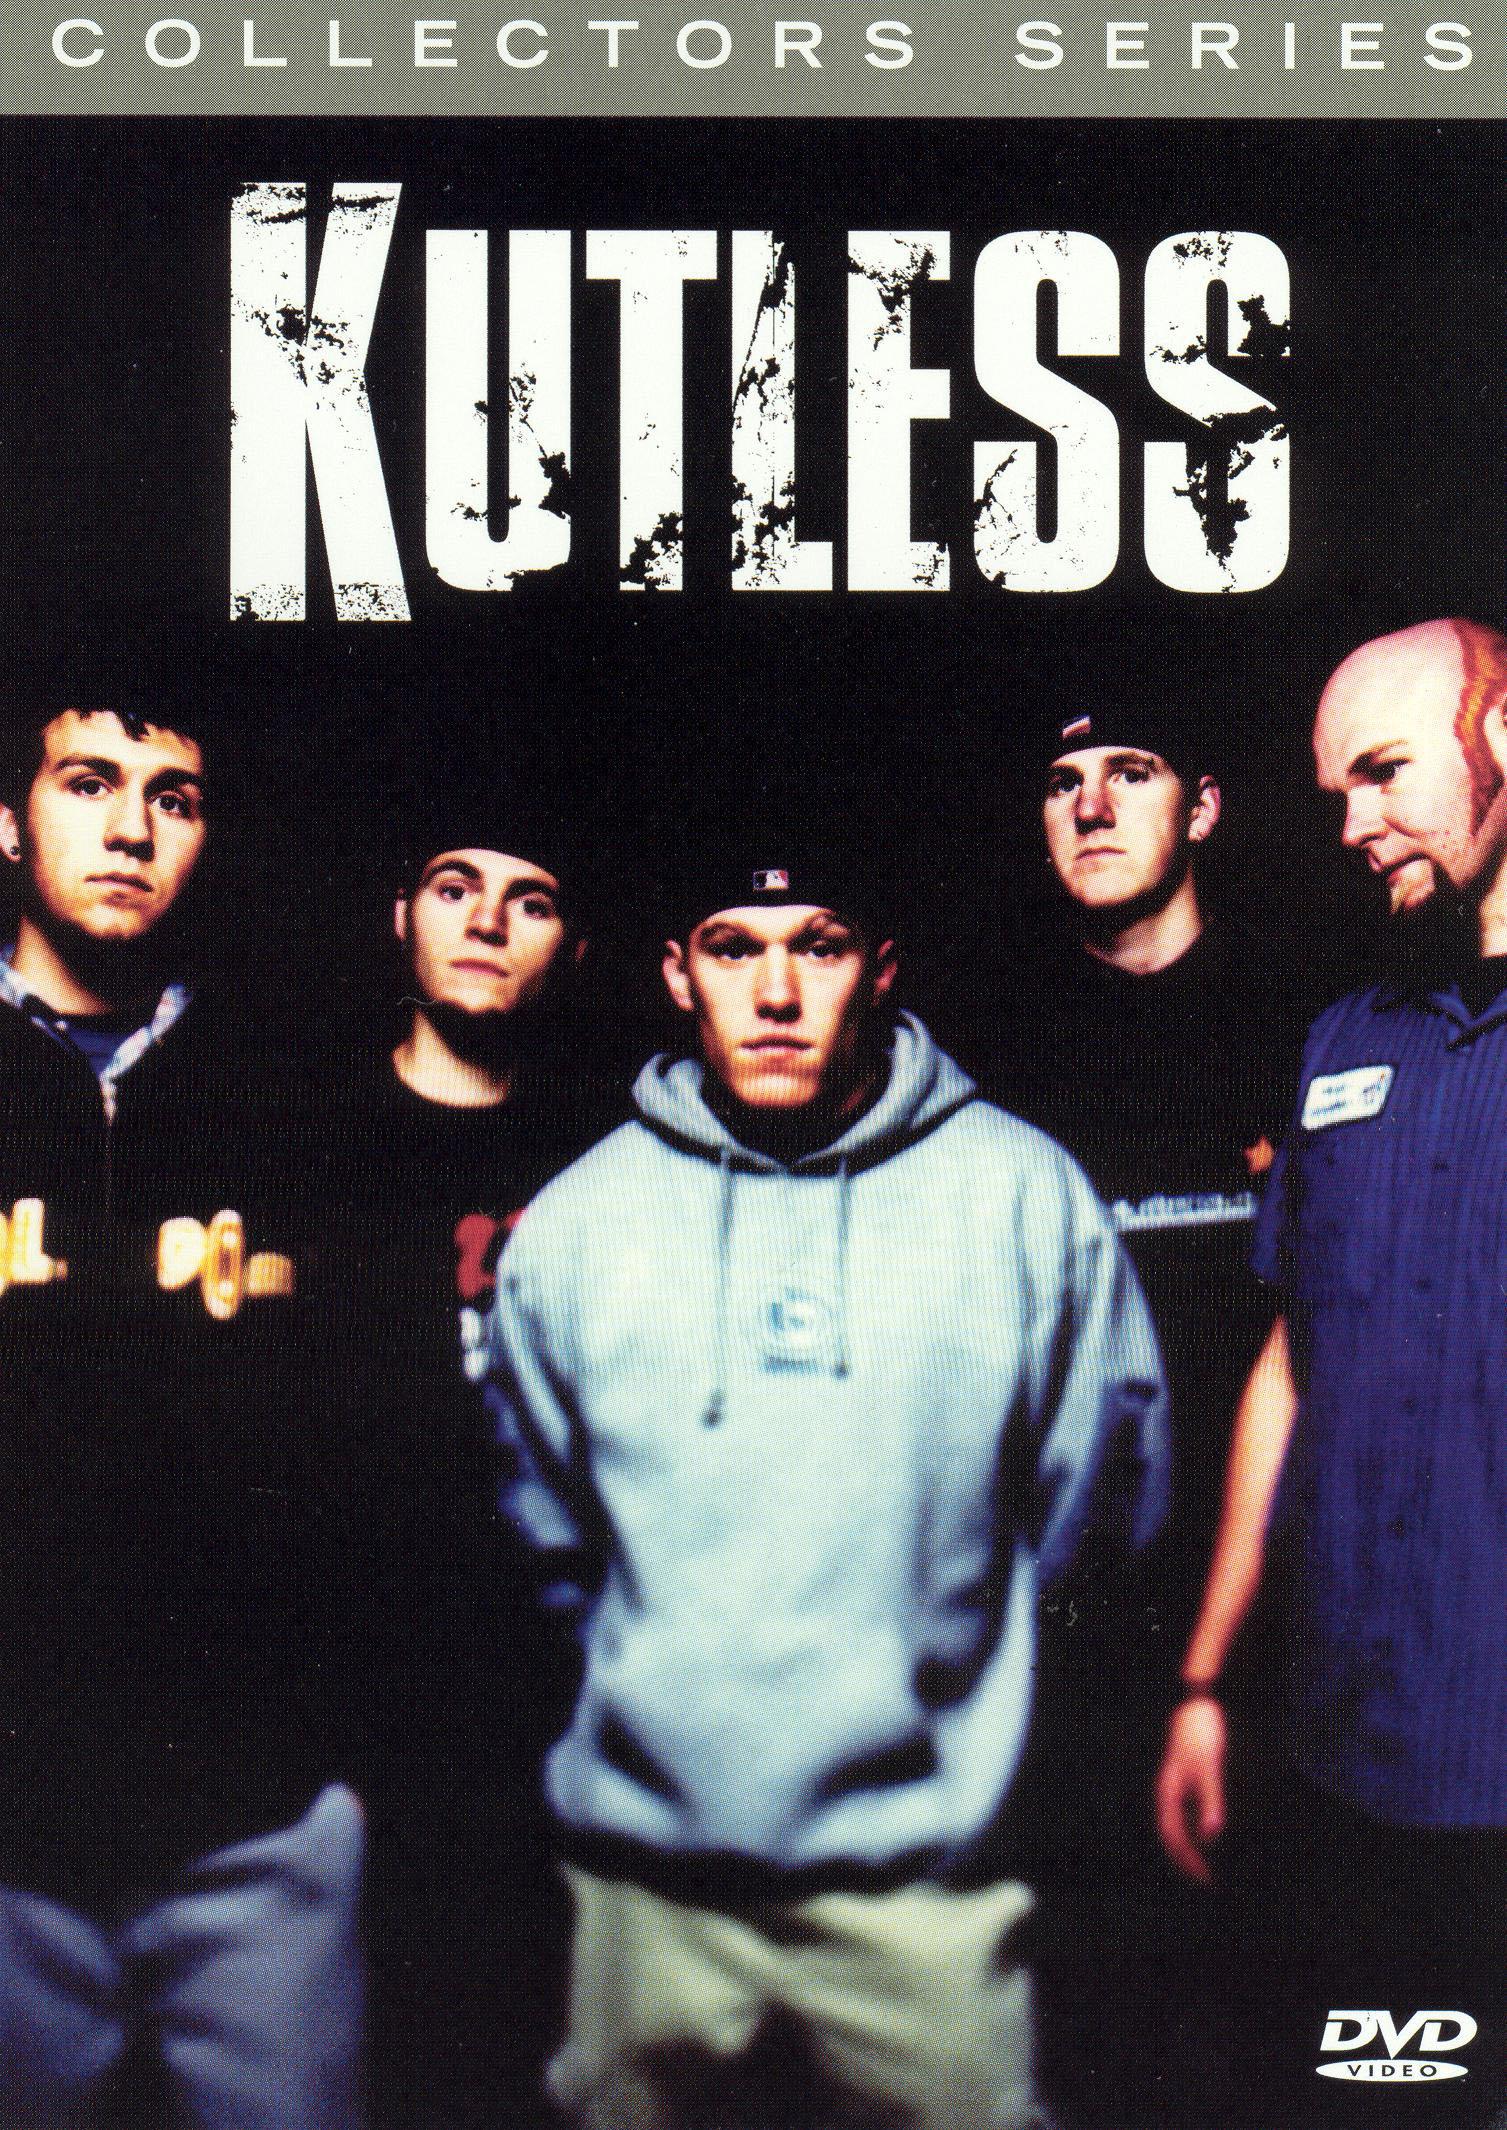 Collectors Series: Kutless